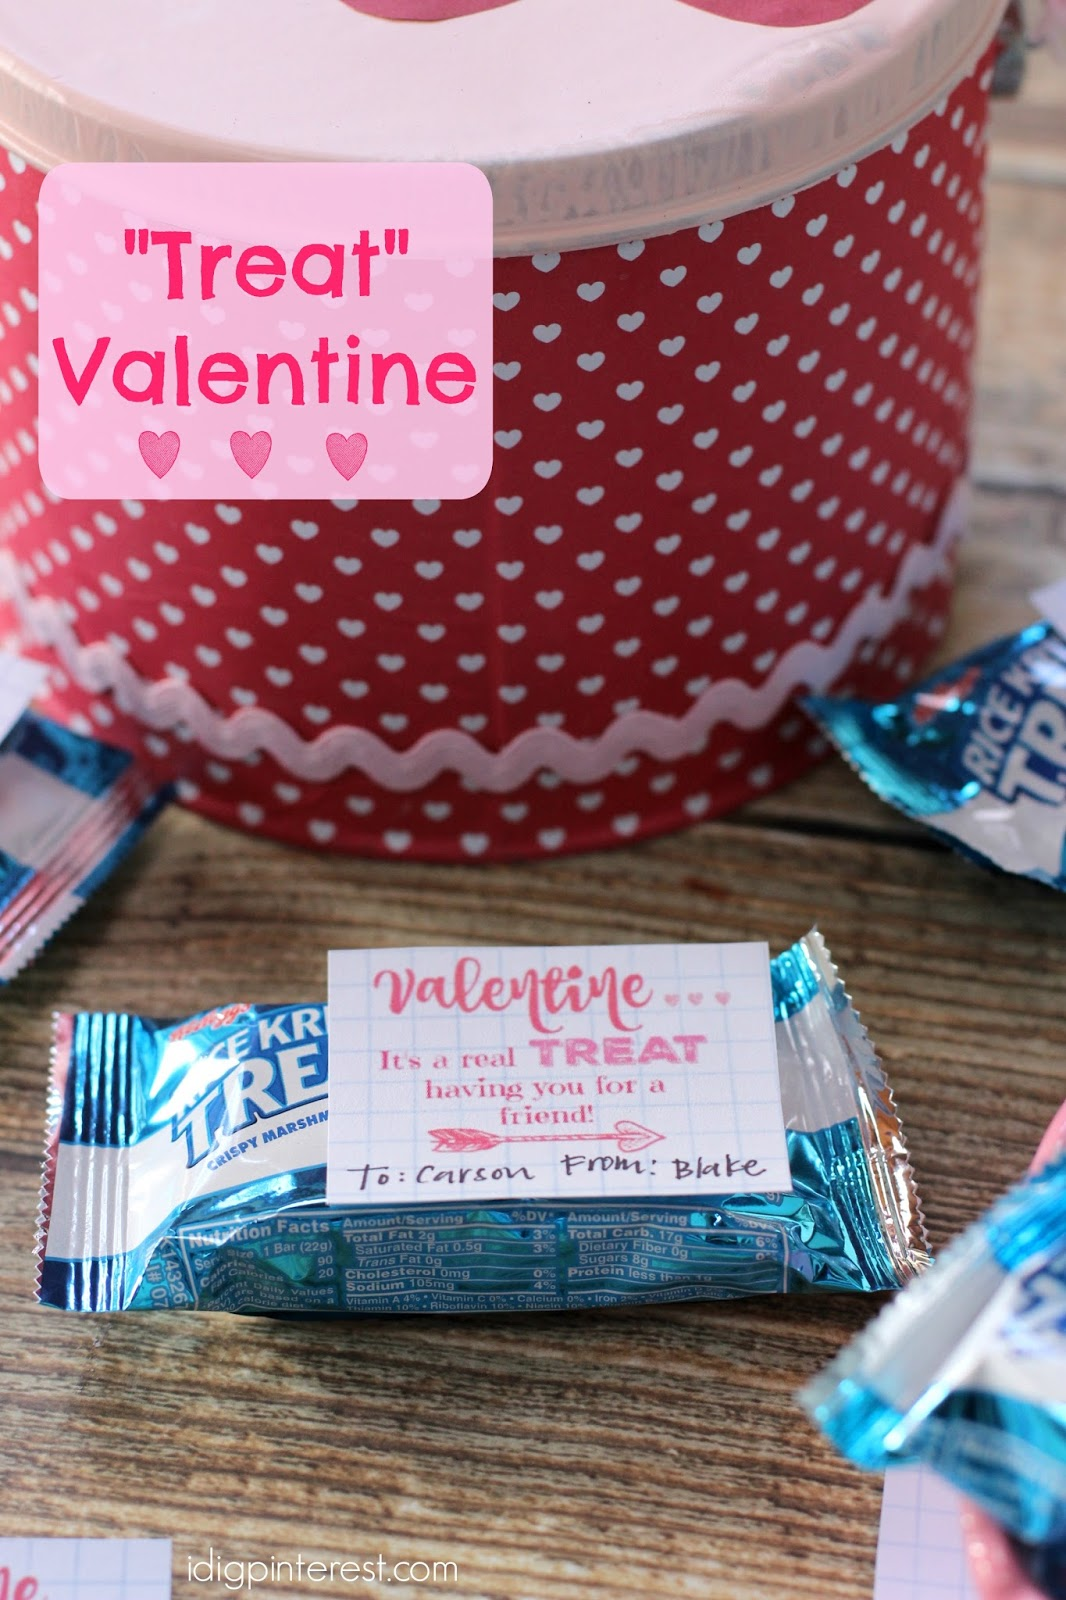 Treat Valentine Idea With Free Printable Tags I Dig